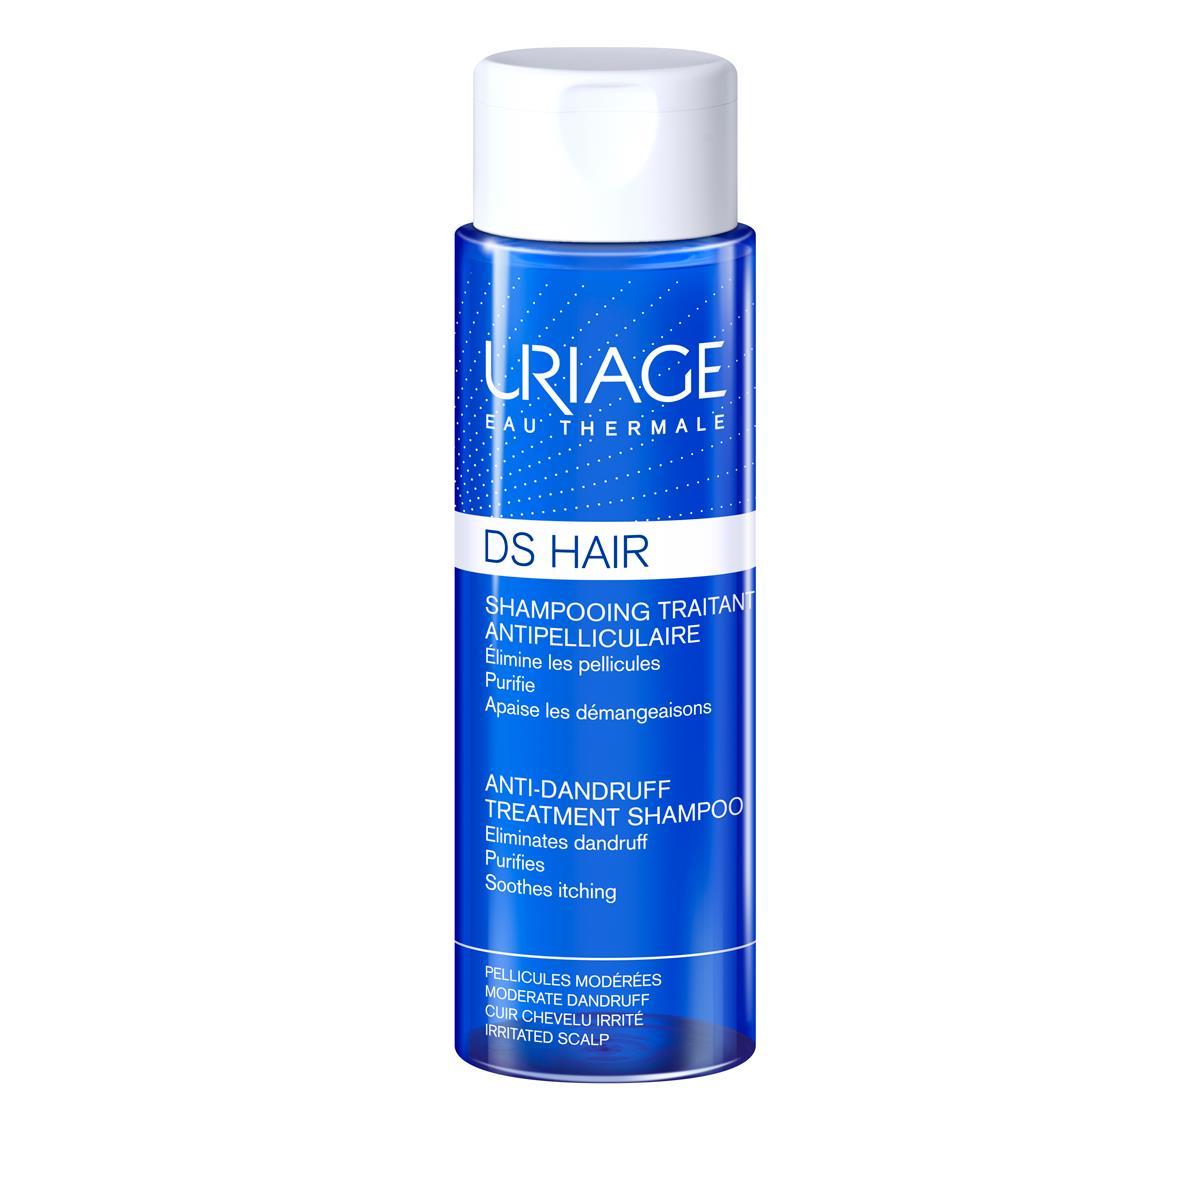 Ds Hair Shampoo Tratamiento Estados Escamosos 200Ml